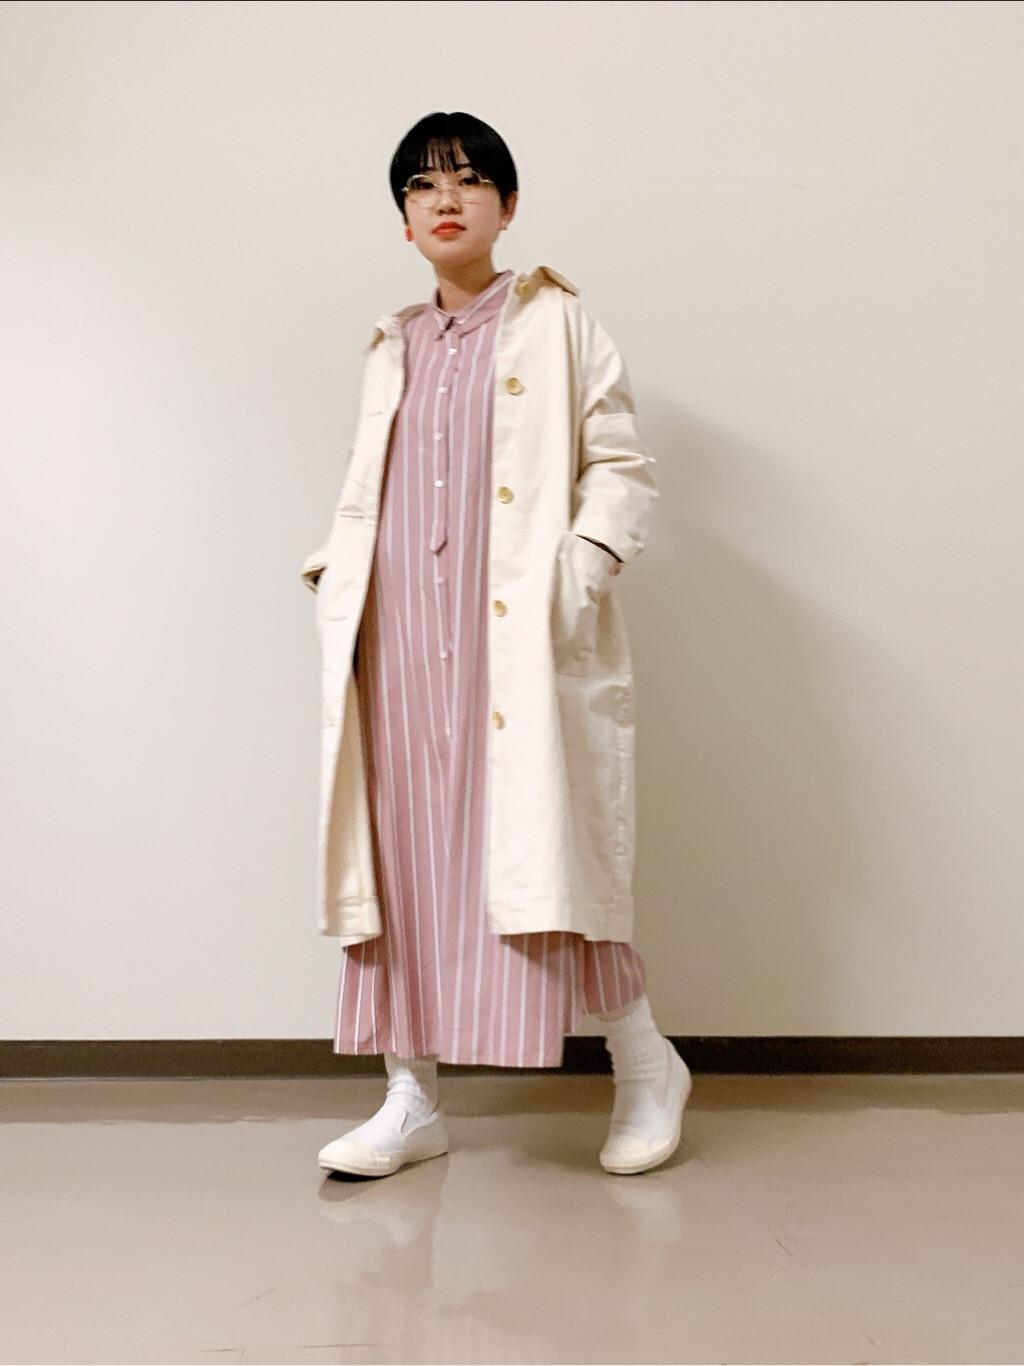 bulle de savon 吉祥寺パルコ 身長:154cm 2020.01.18